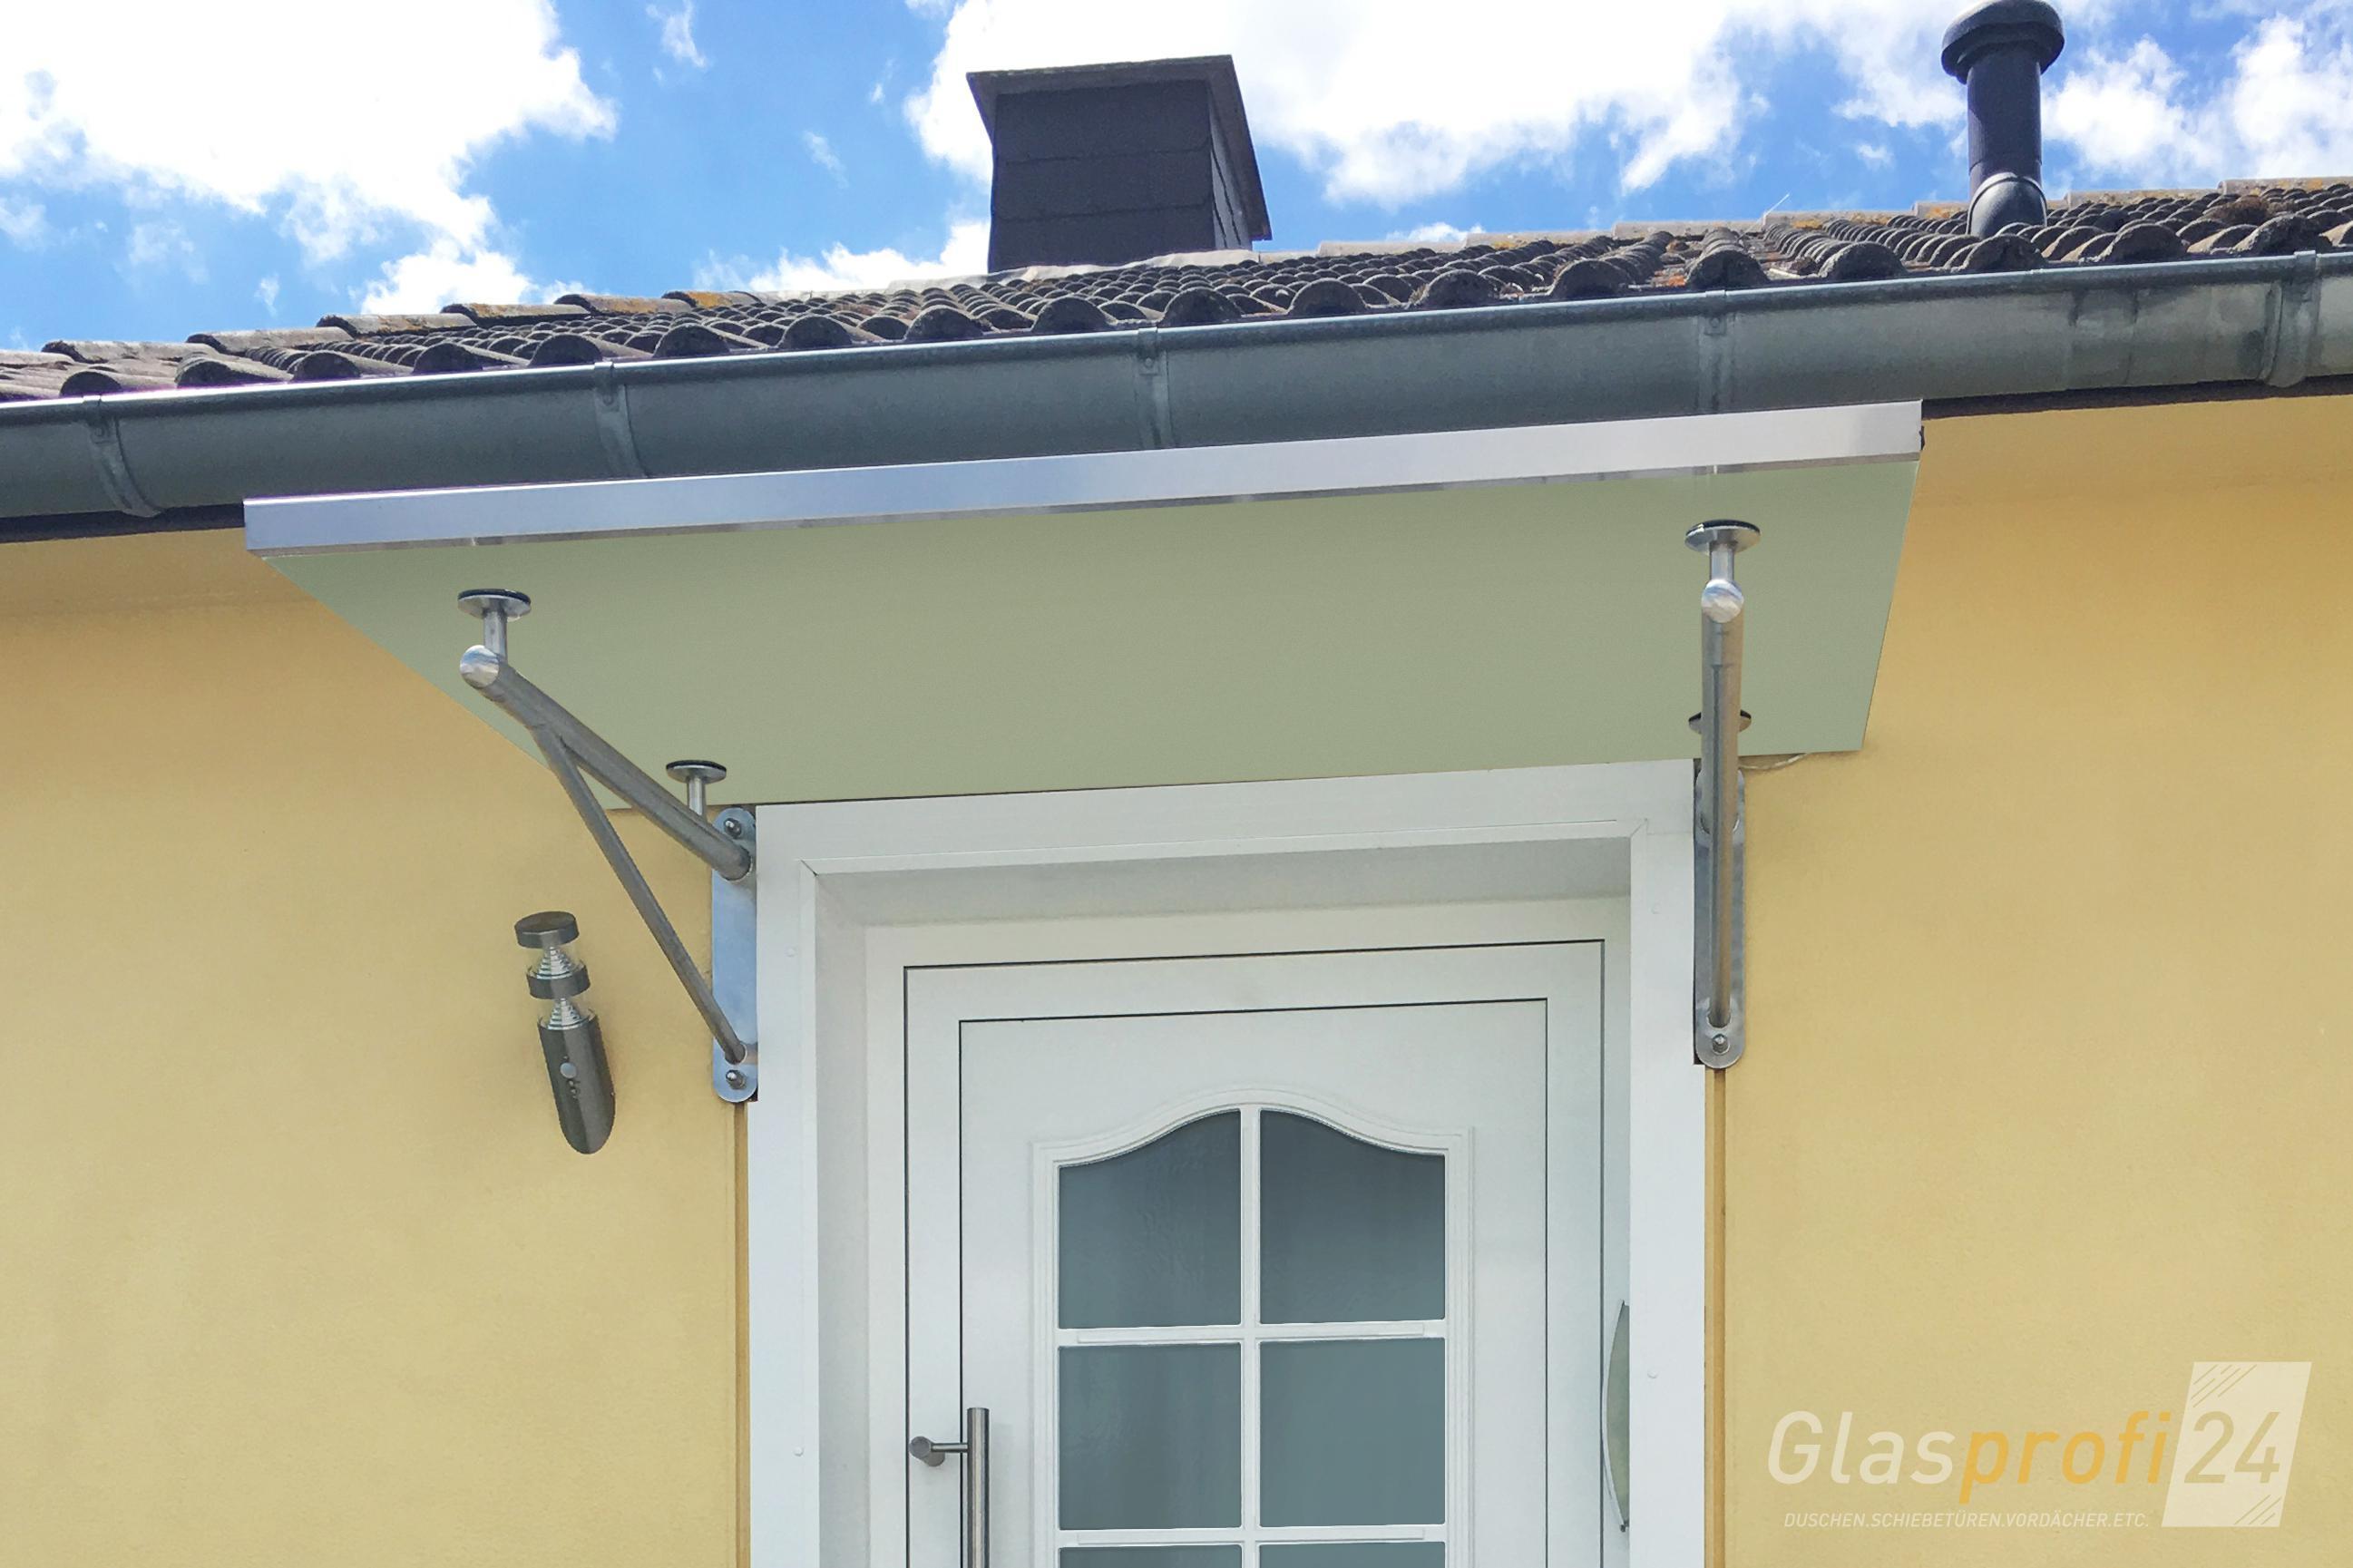 Gut gemocht Edelstahlvordach mit Glas TRAVE | GLASPROFI24 XI73